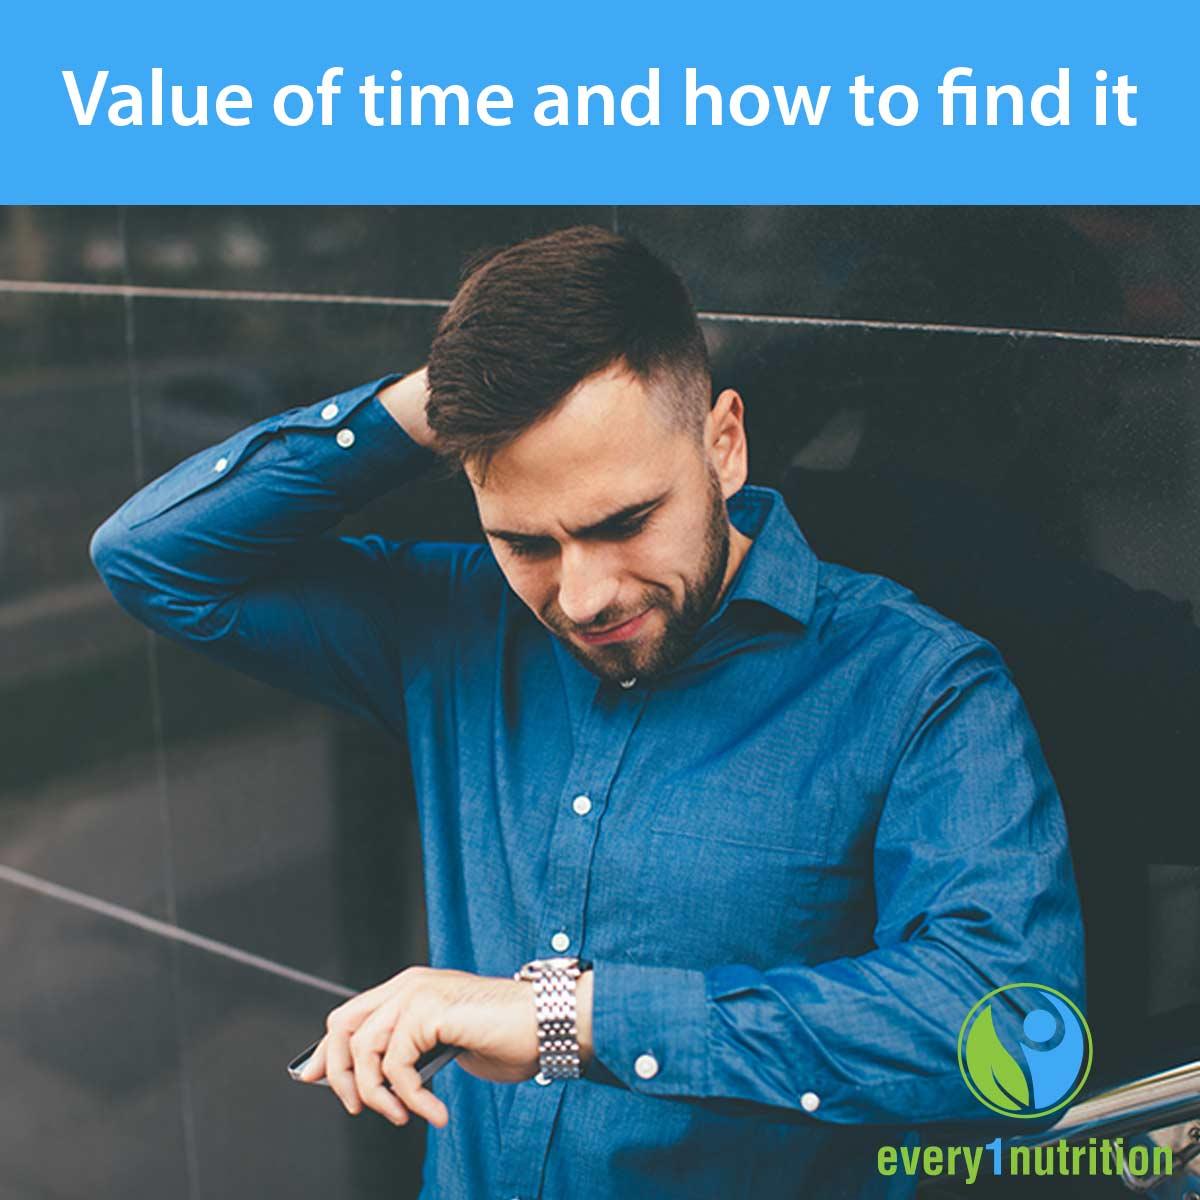 value_of_time.jpg